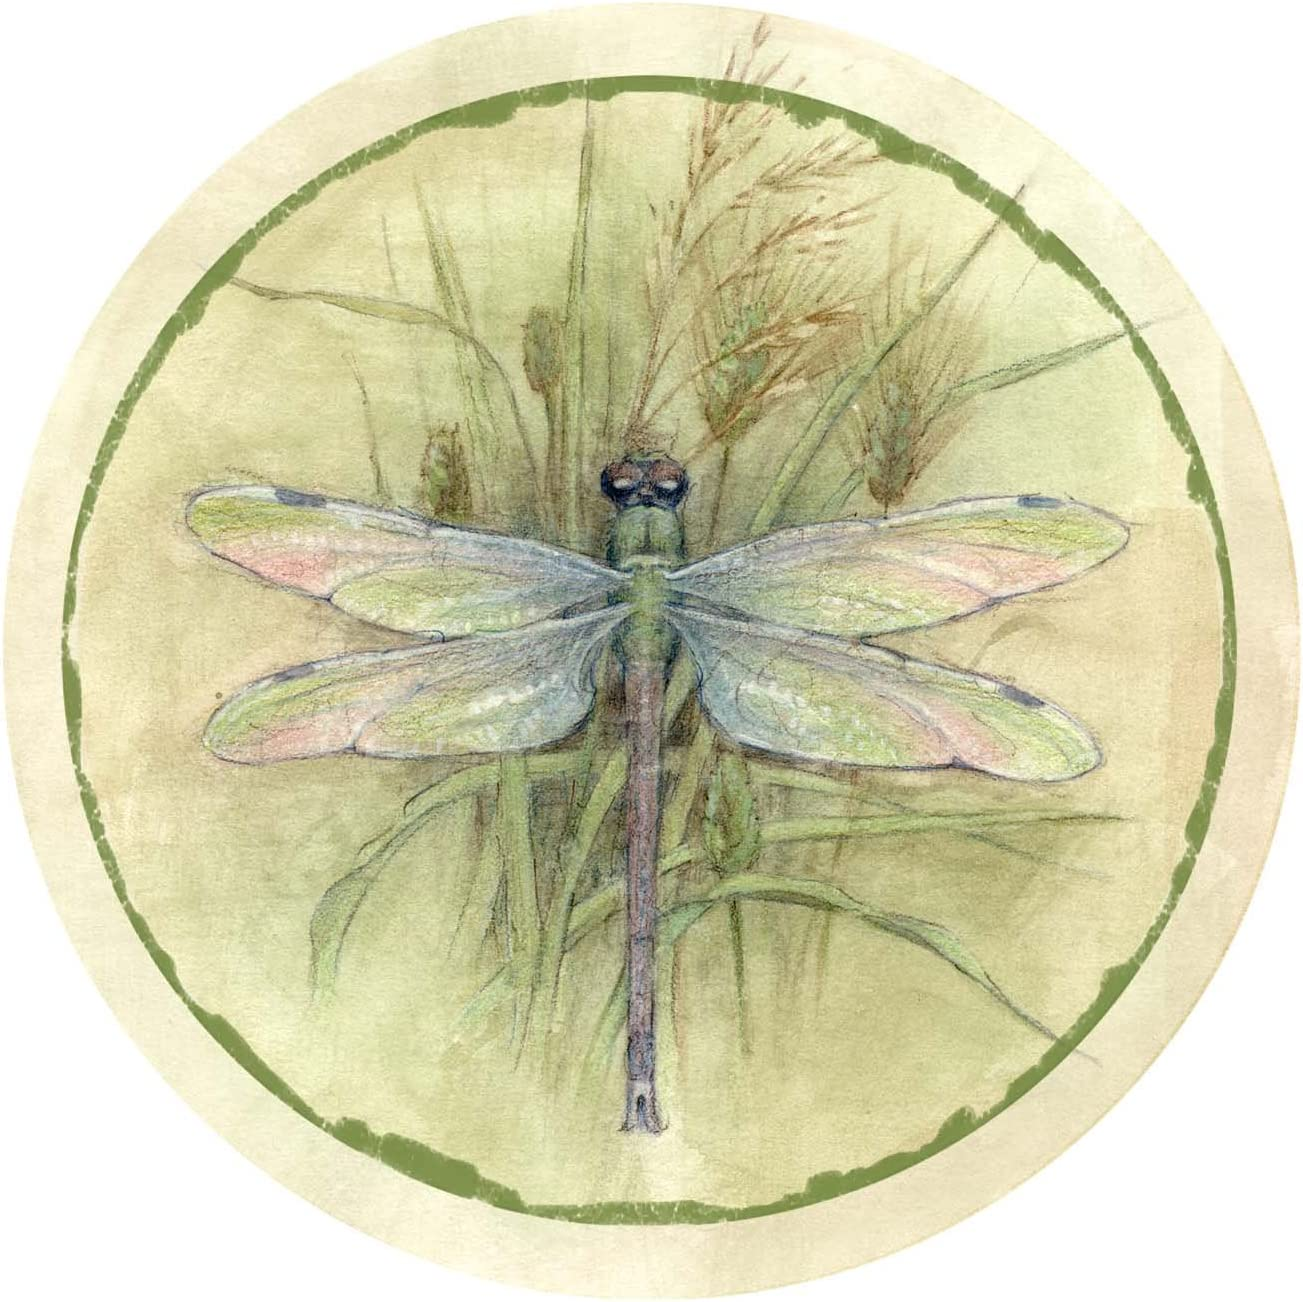 Thirstystone Stoneware Coaster Set, Dragonfly